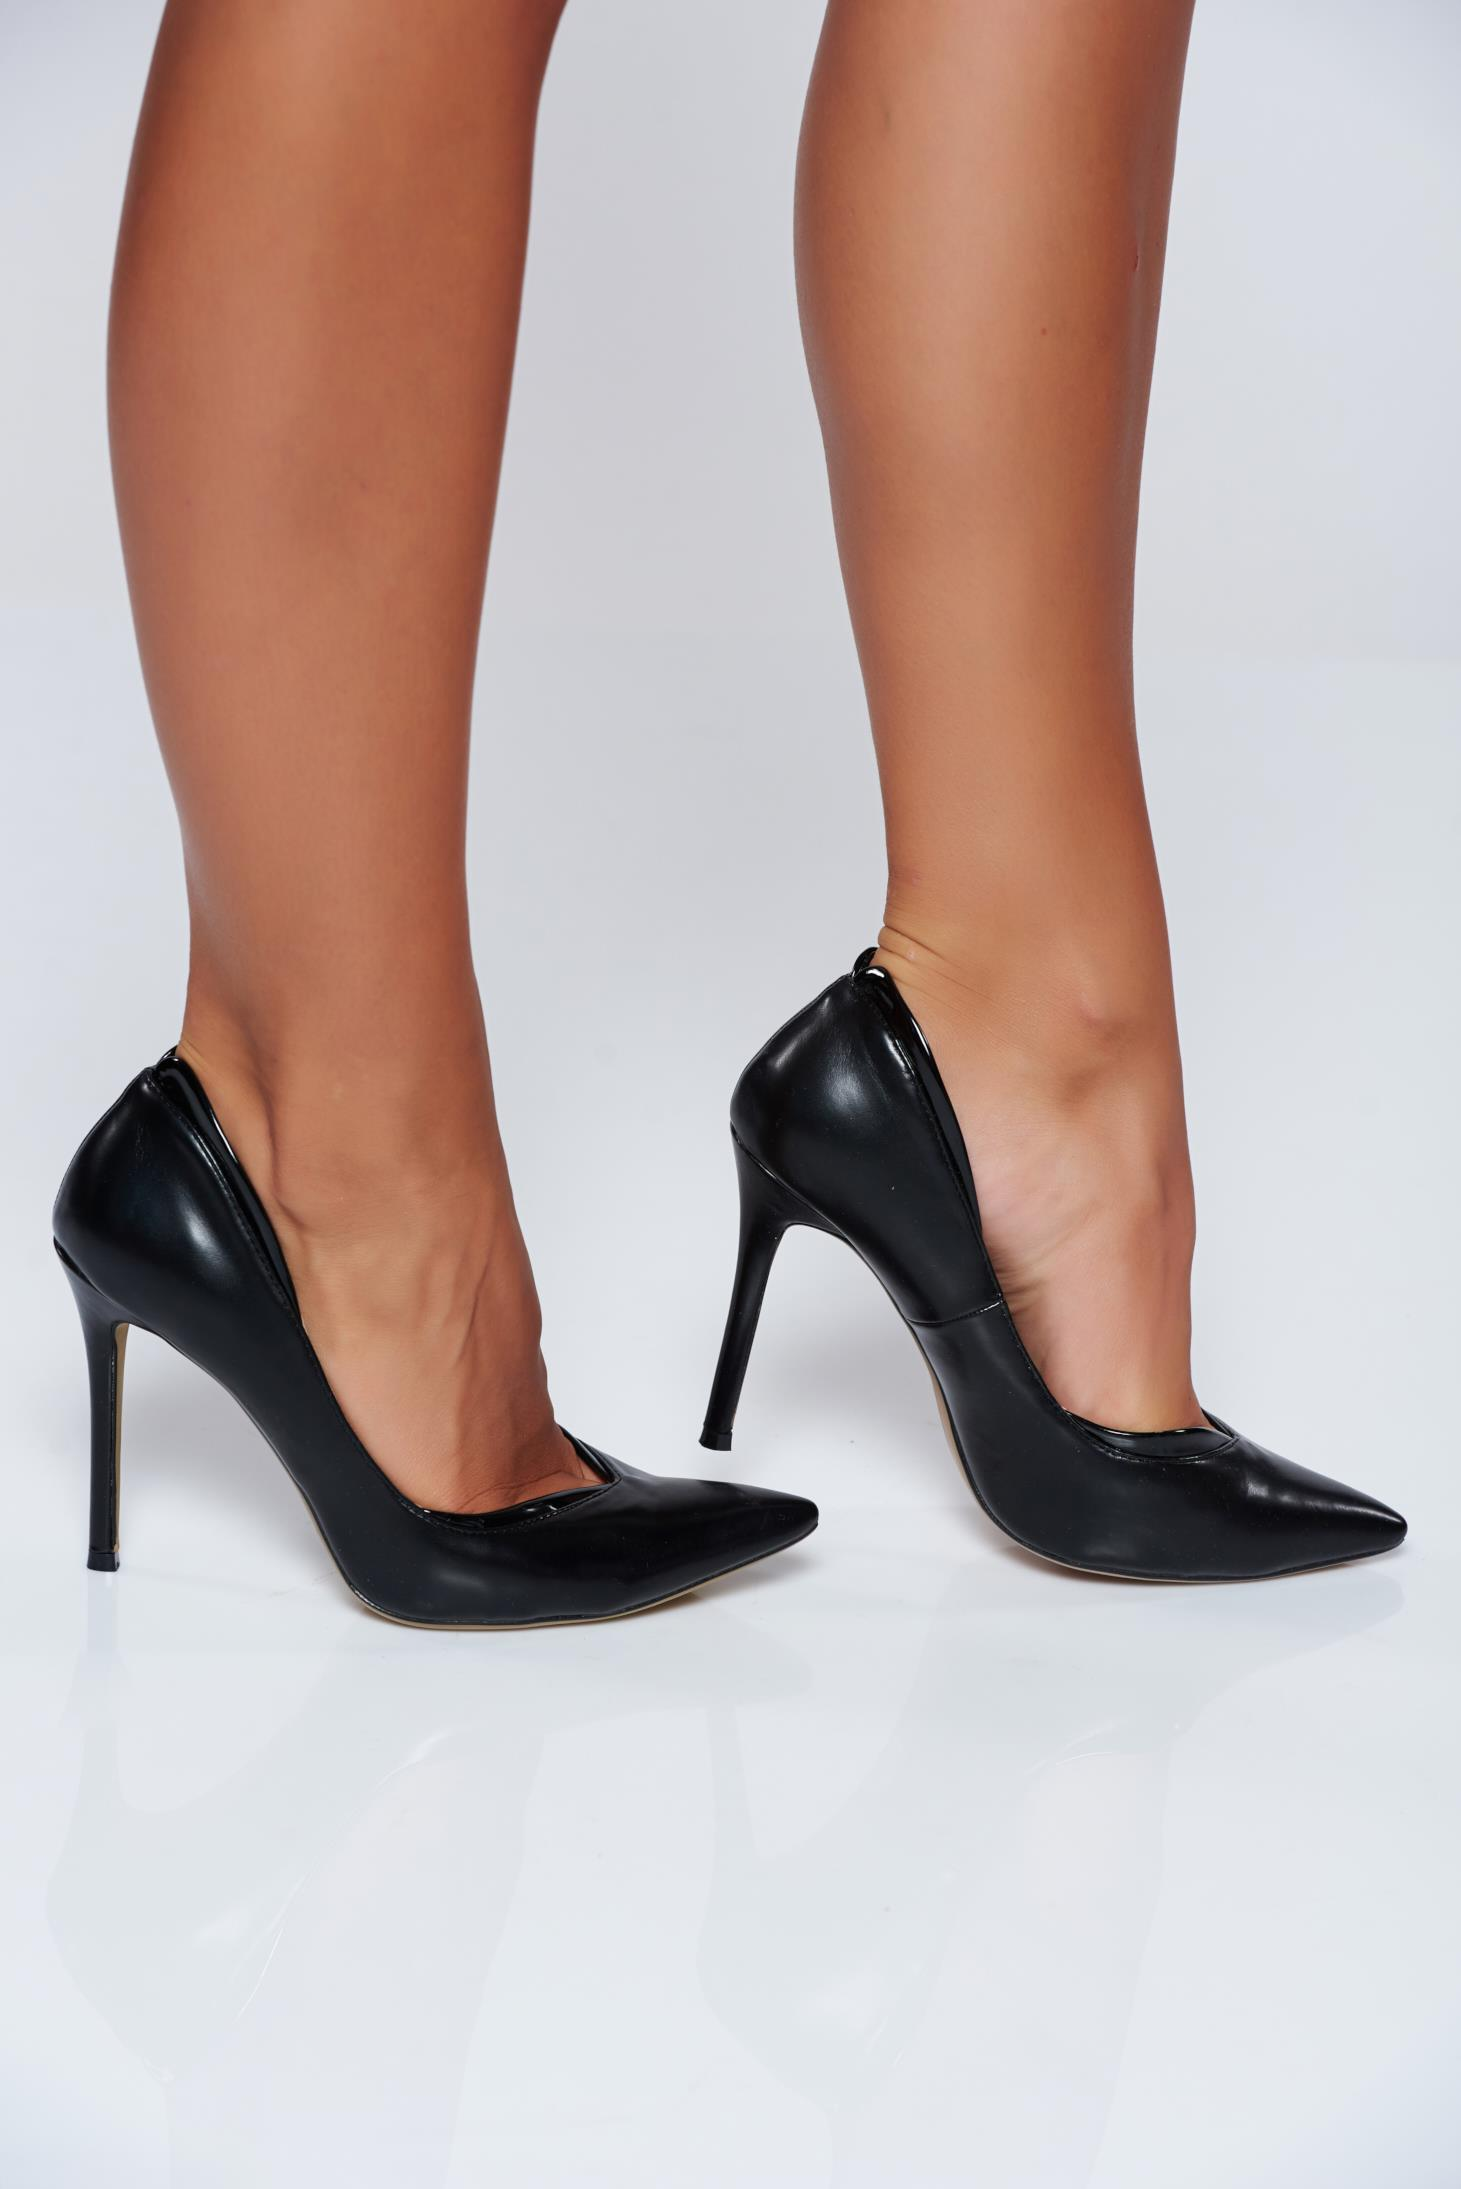 Office high heels black stiletto